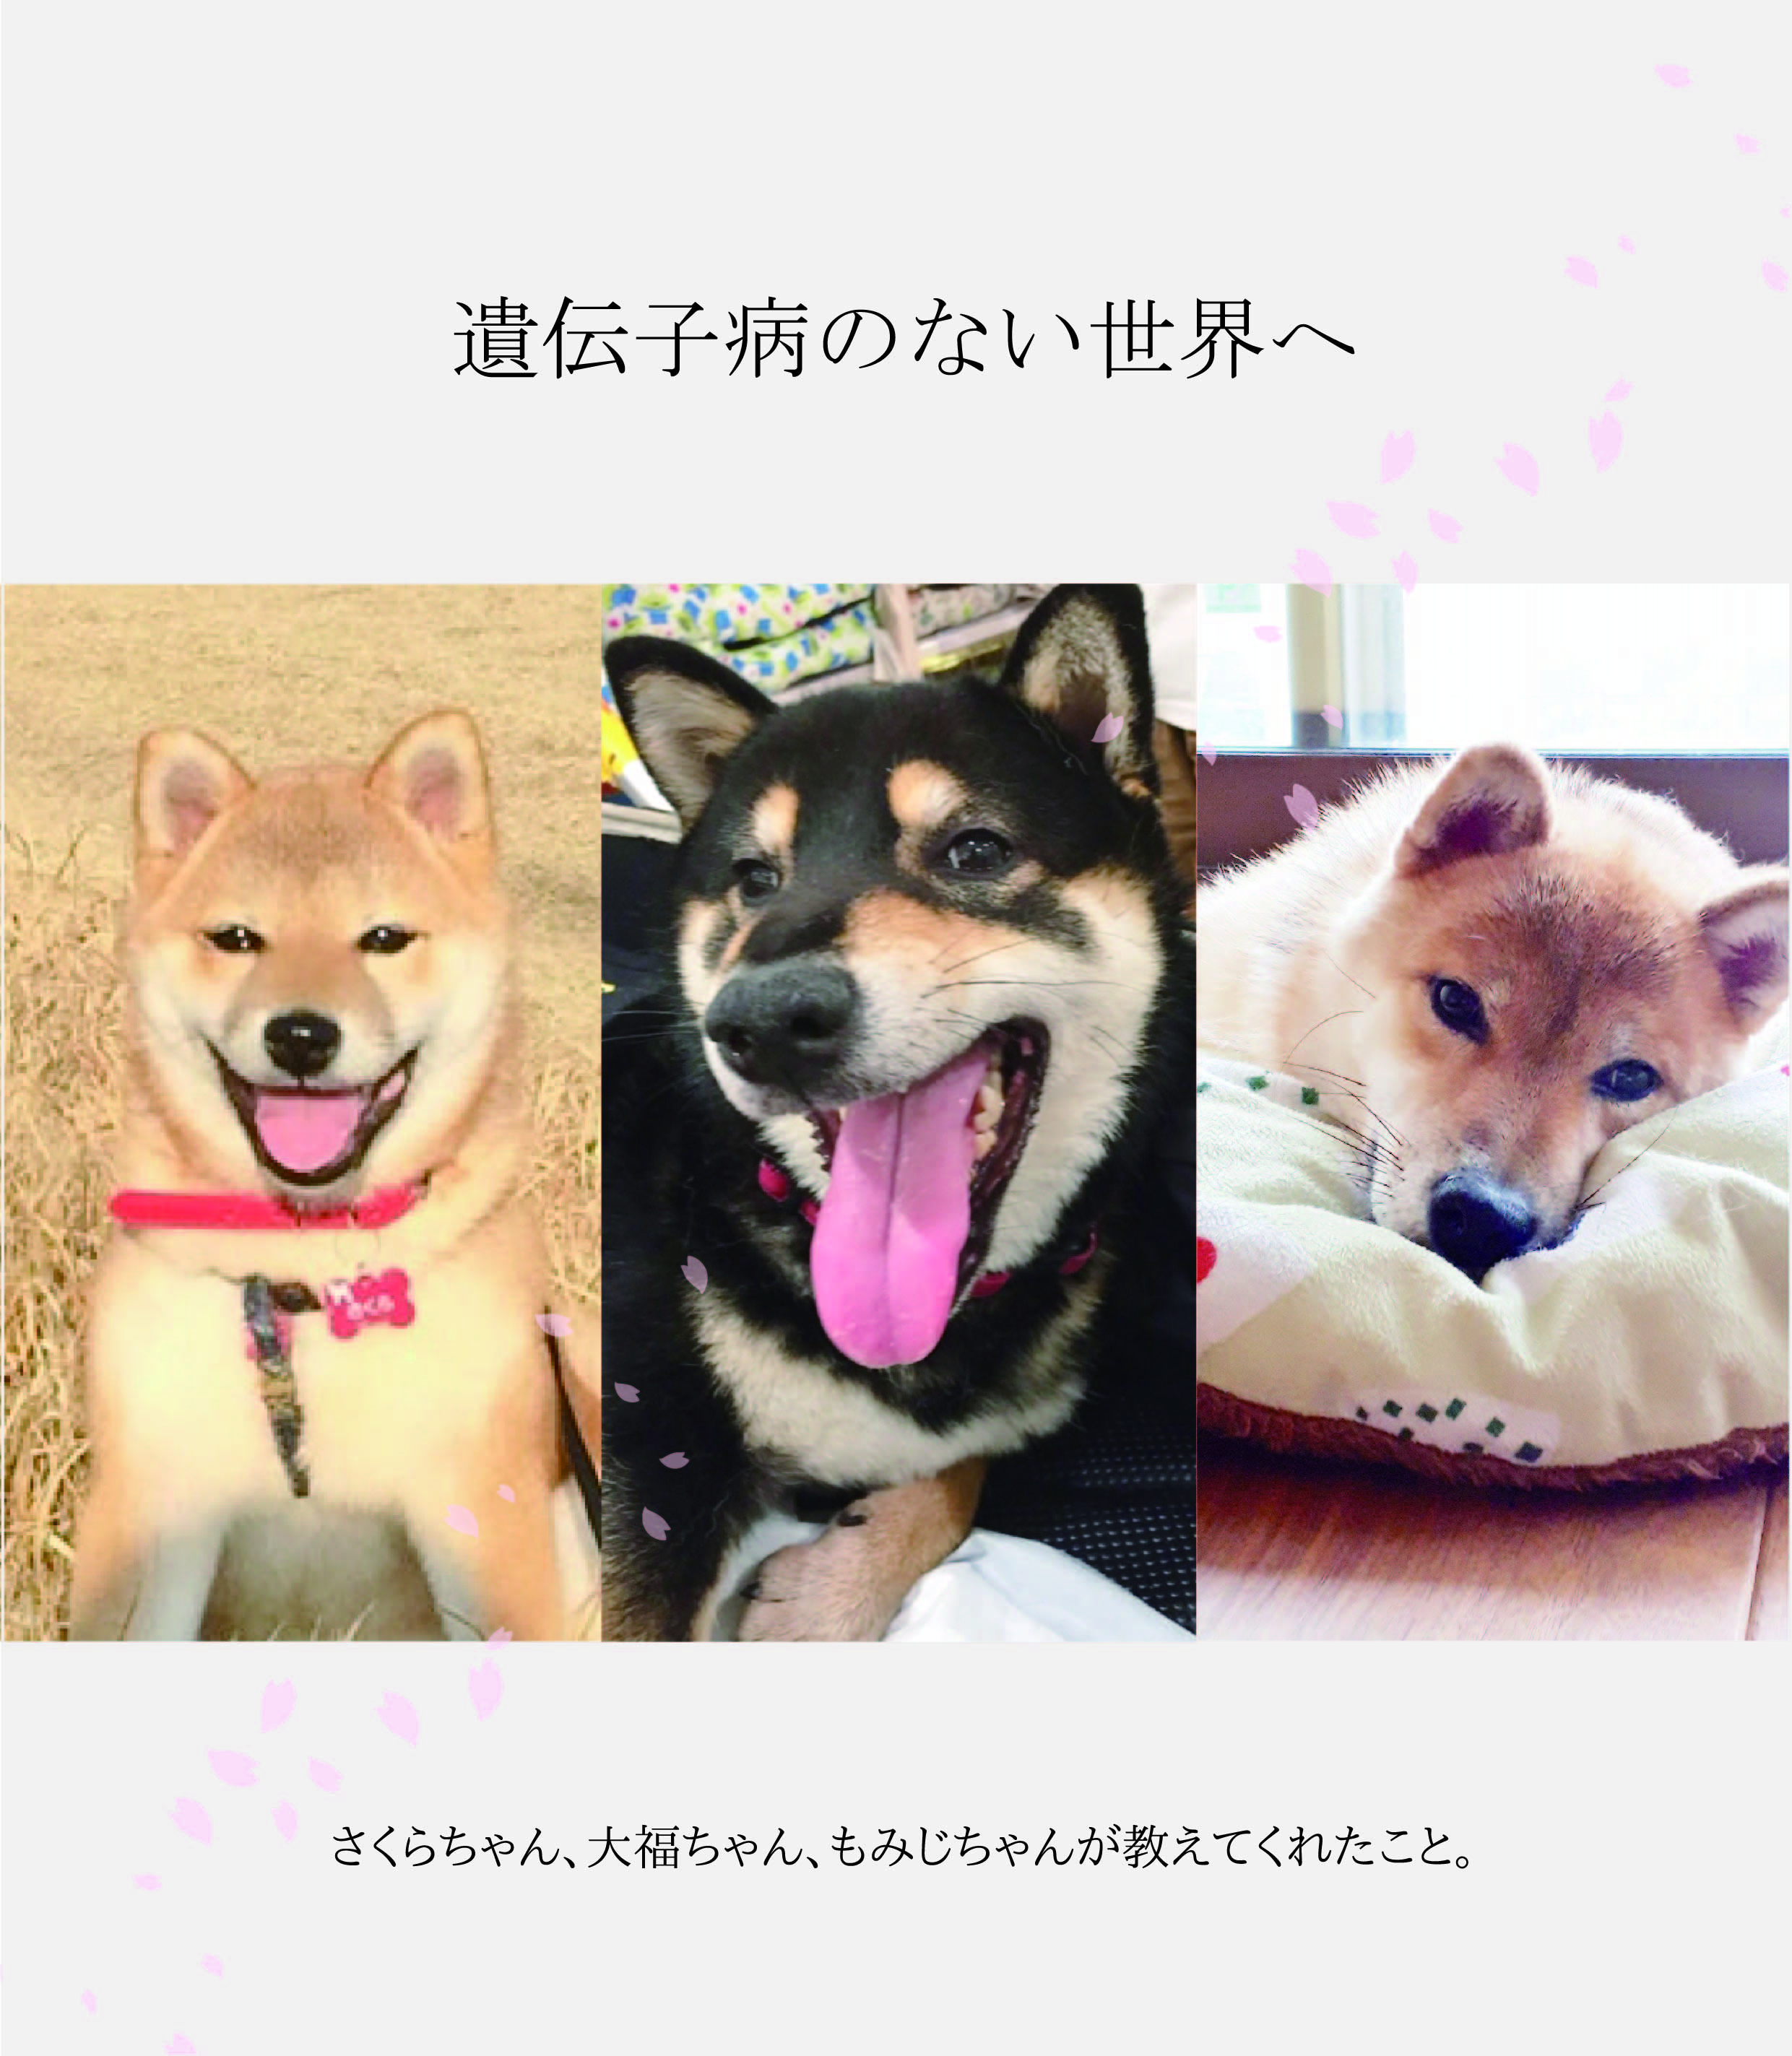 https://www.ahb.jpn.com/images/news/2299/file.jpeg